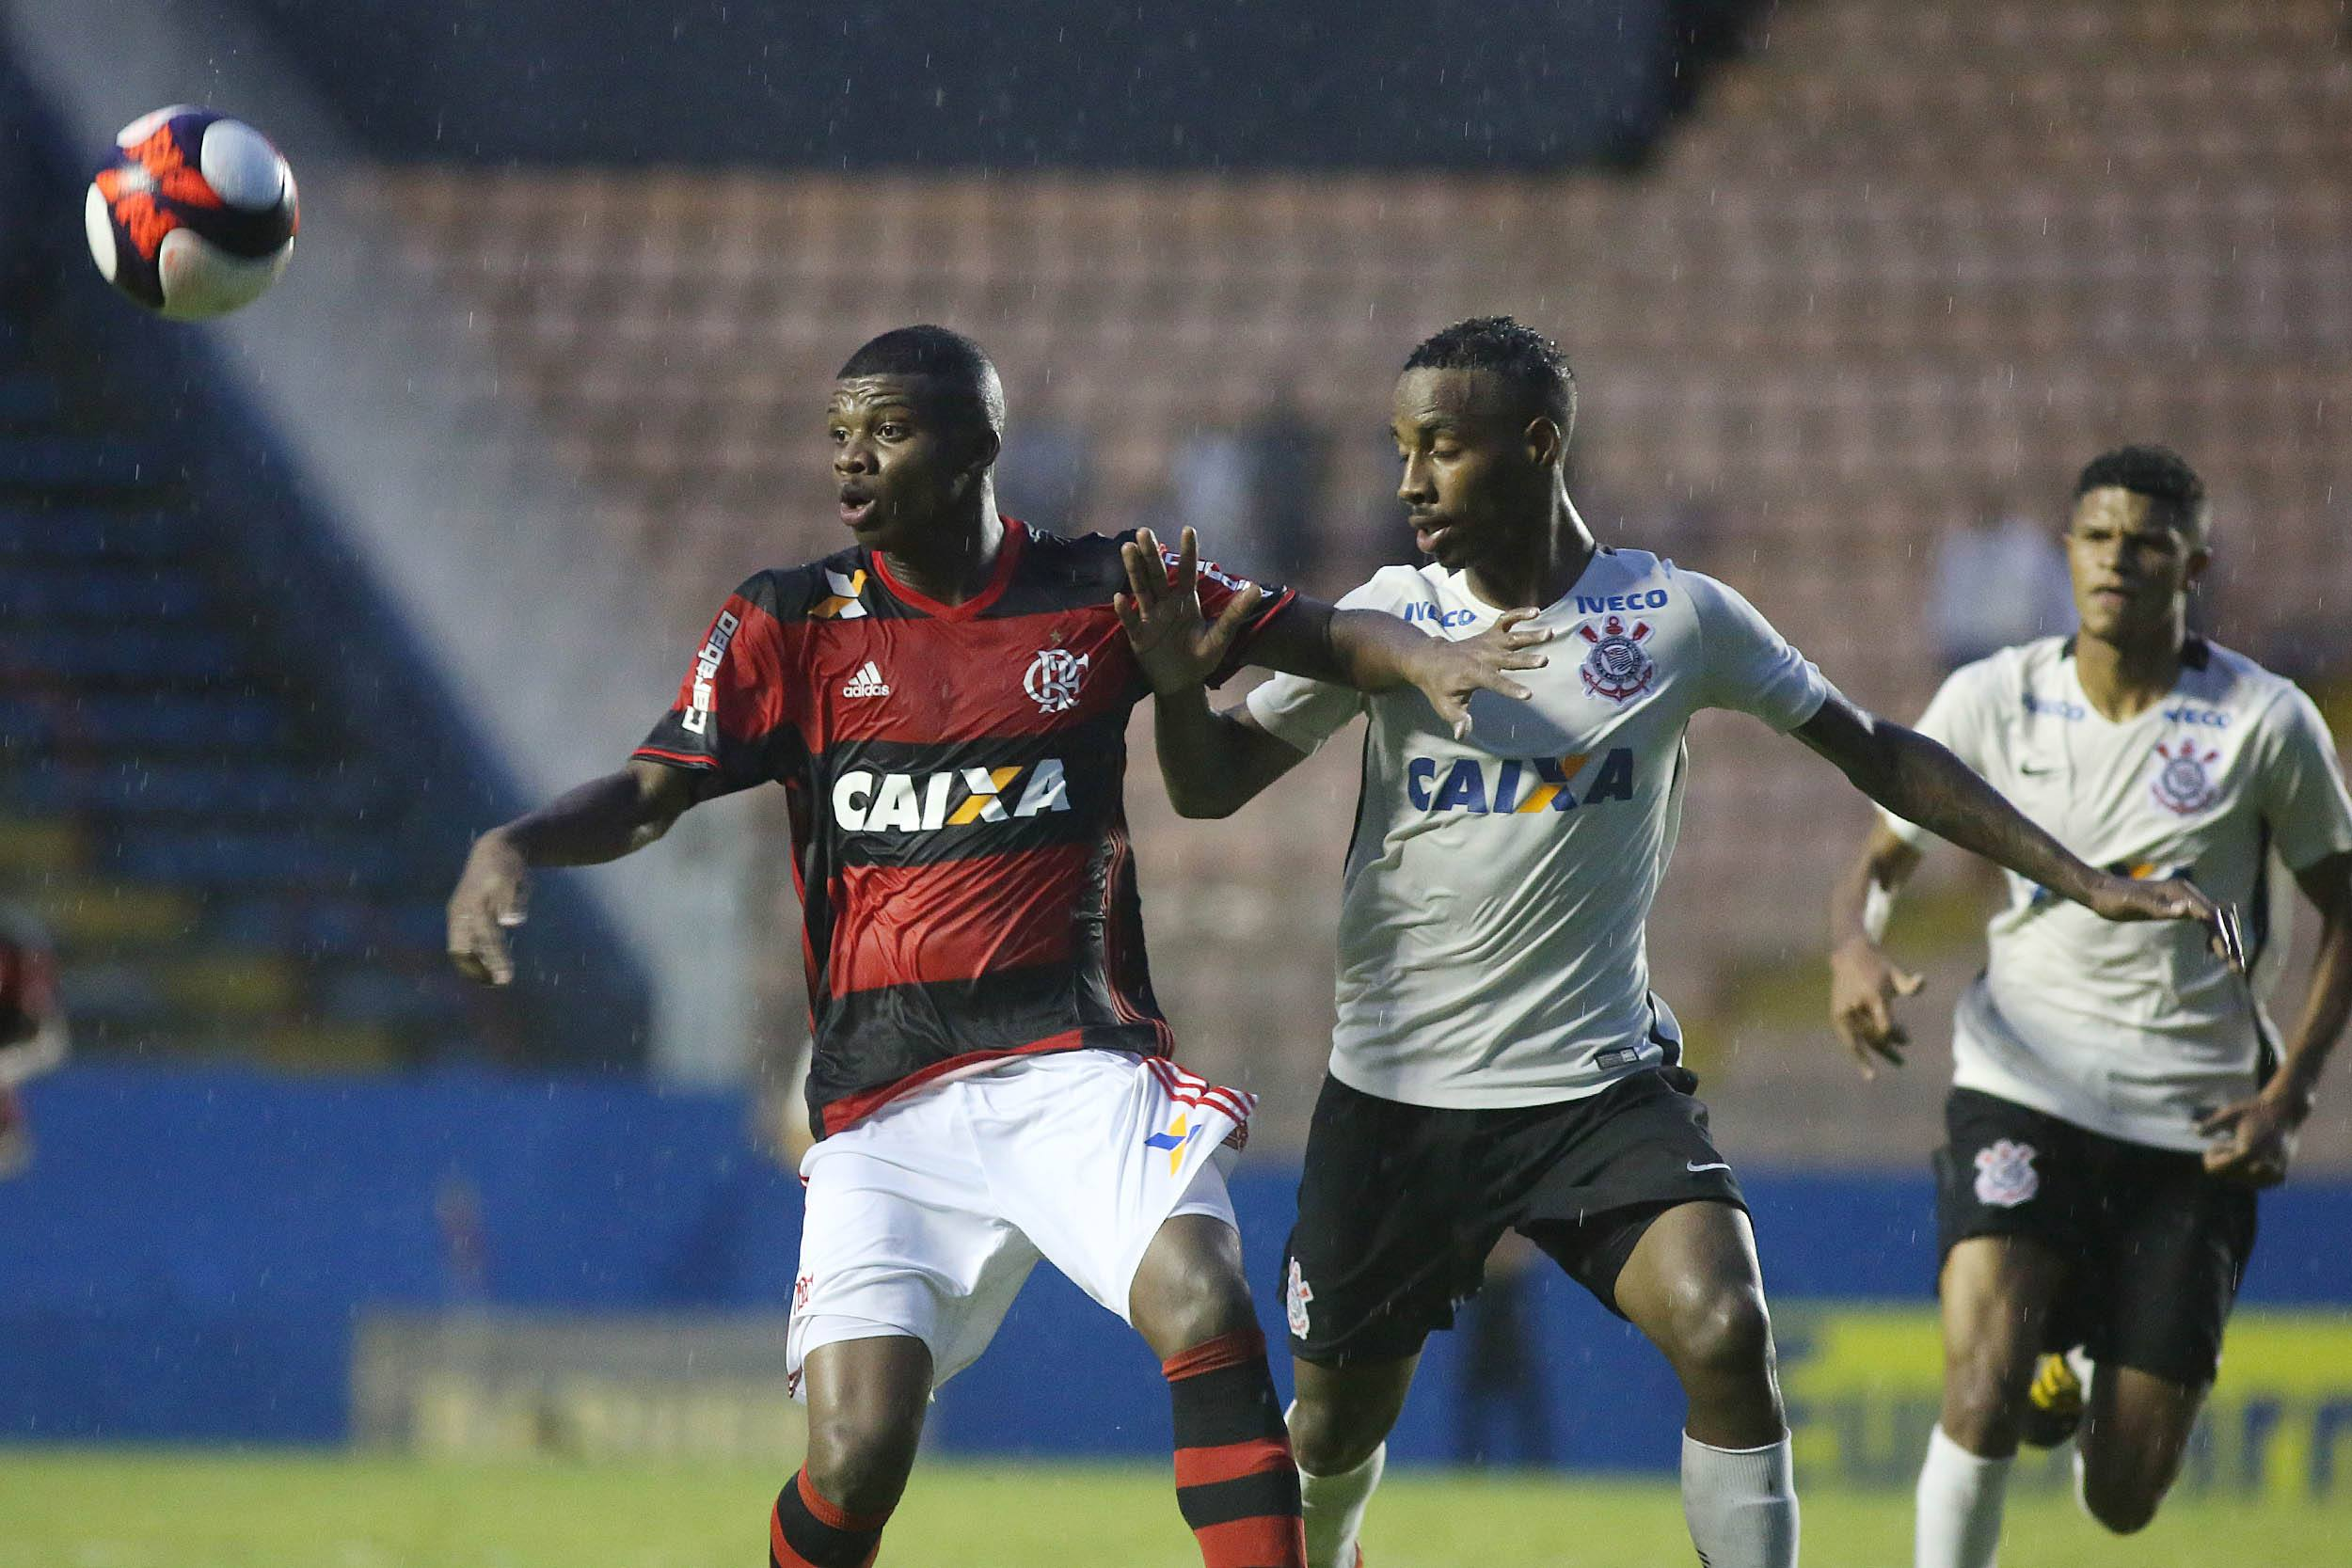 Corinthians Flamengo Maçı İddaa Tahmini 30.07.2017